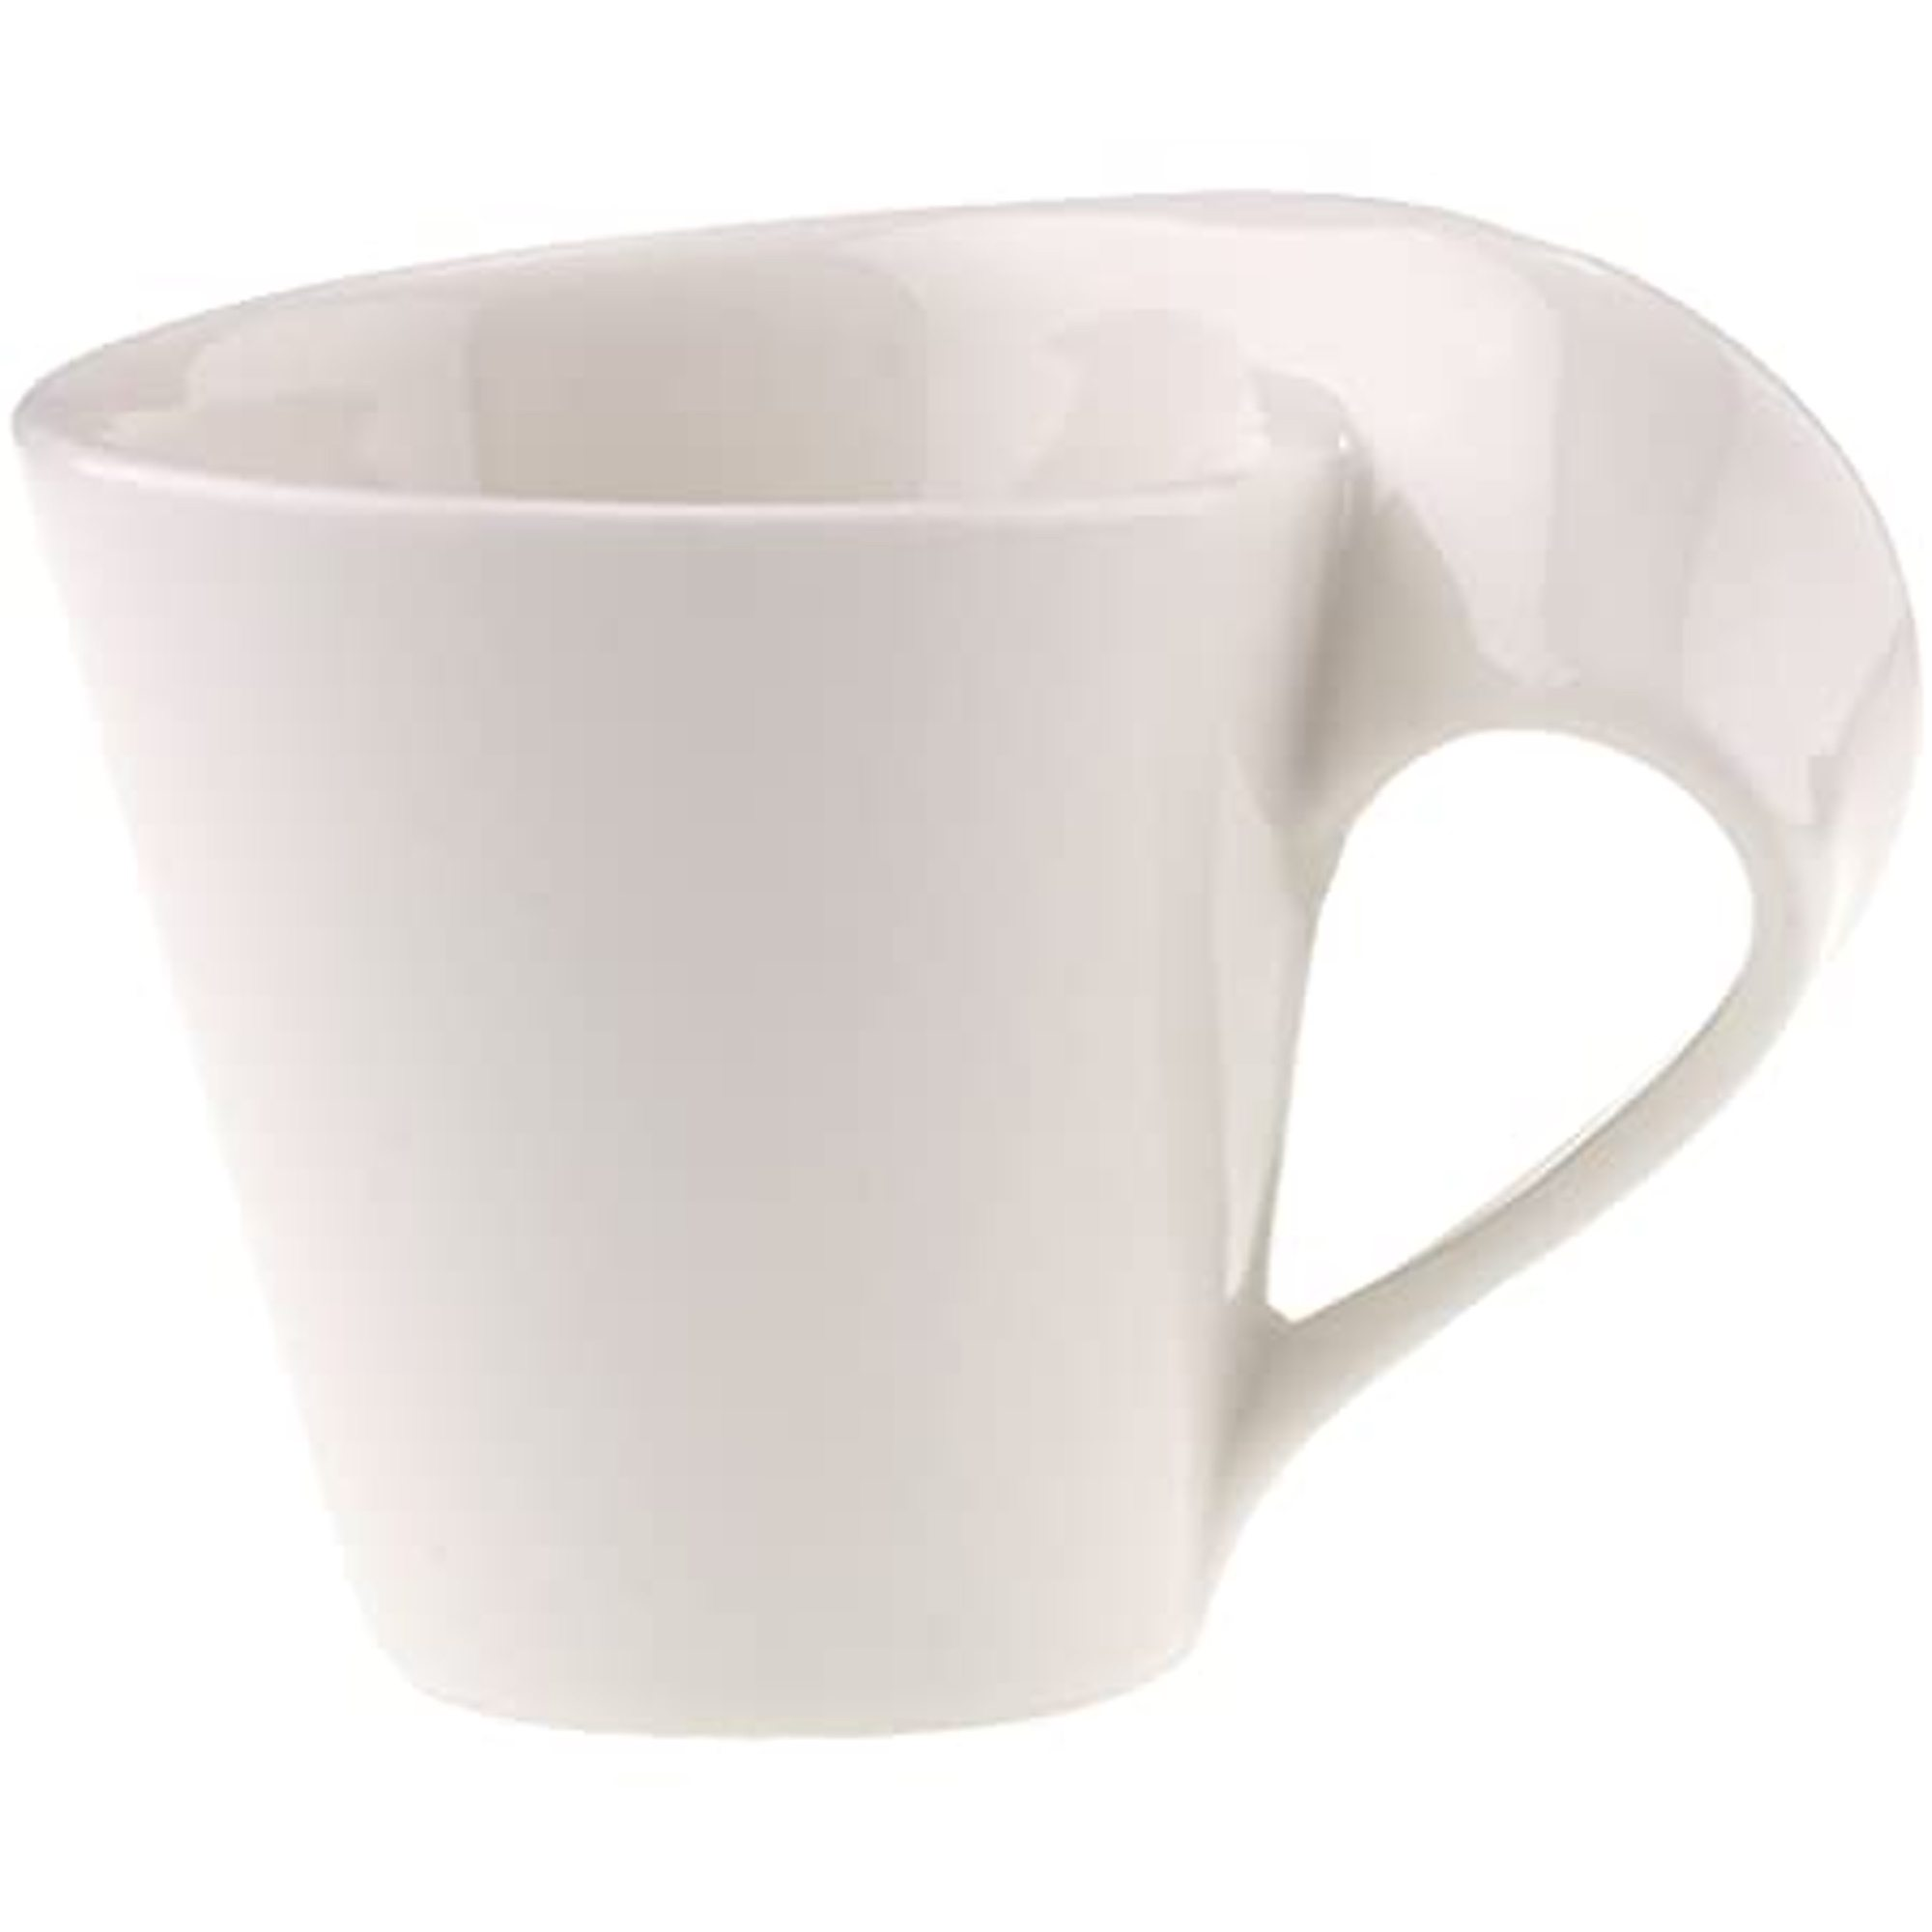 New Wave Caffe Espresso Cup 80ml